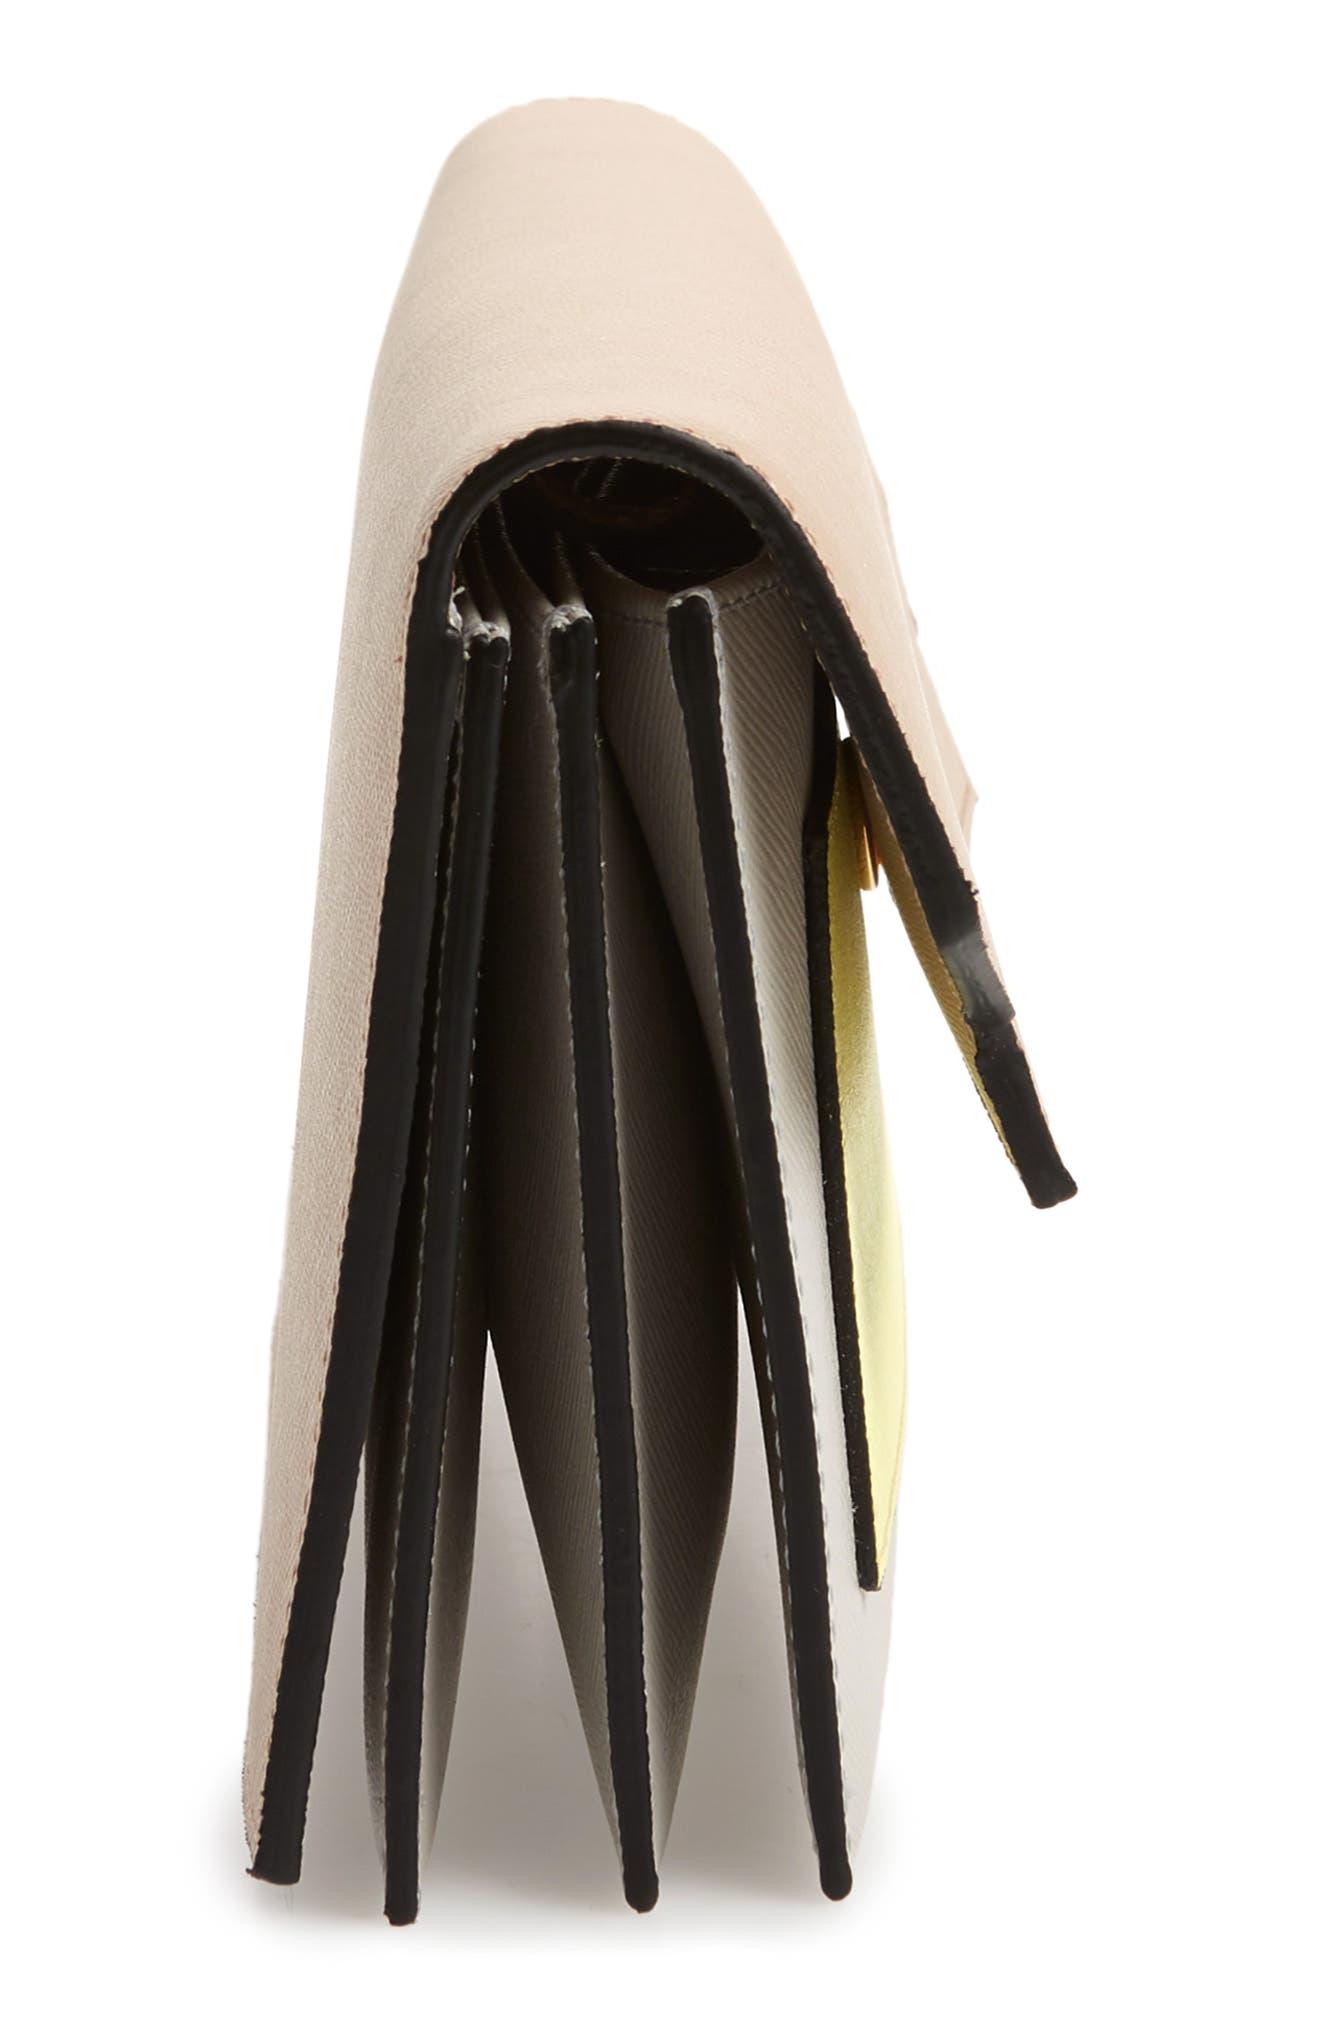 Trunk Leather Crossbody Wallet,                             Alternate thumbnail 6, color,                             LIGHT CAMEL/ VANILLA/ PELICAN